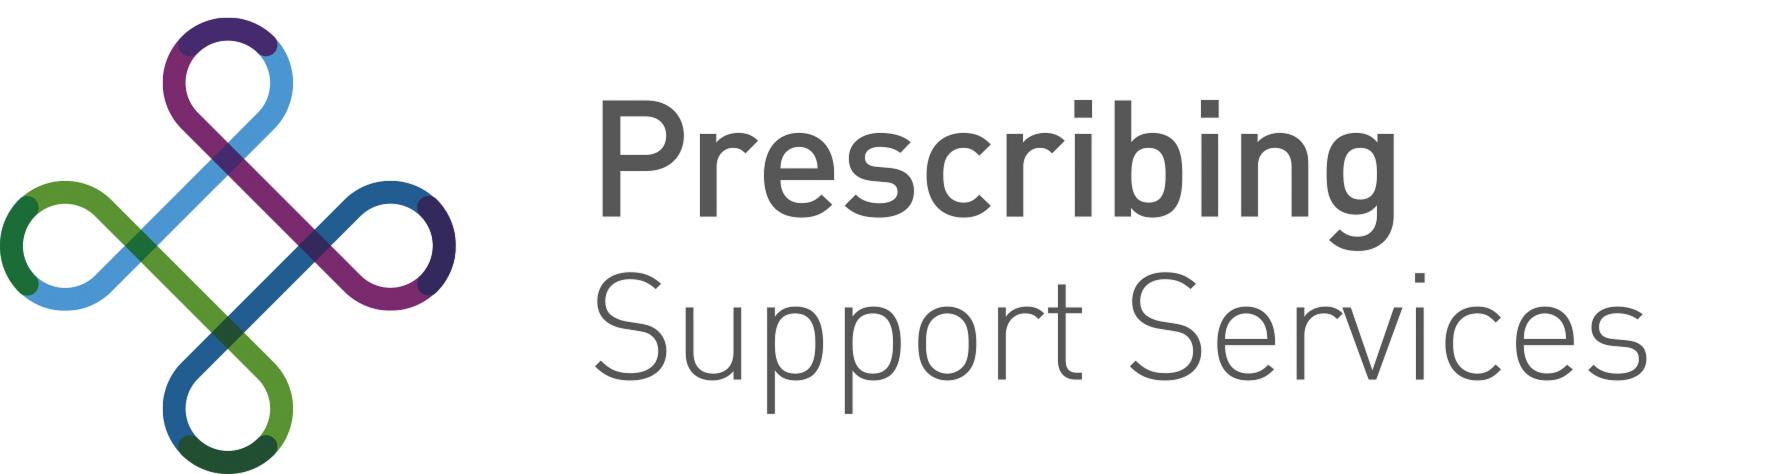 Prescribing Support Services